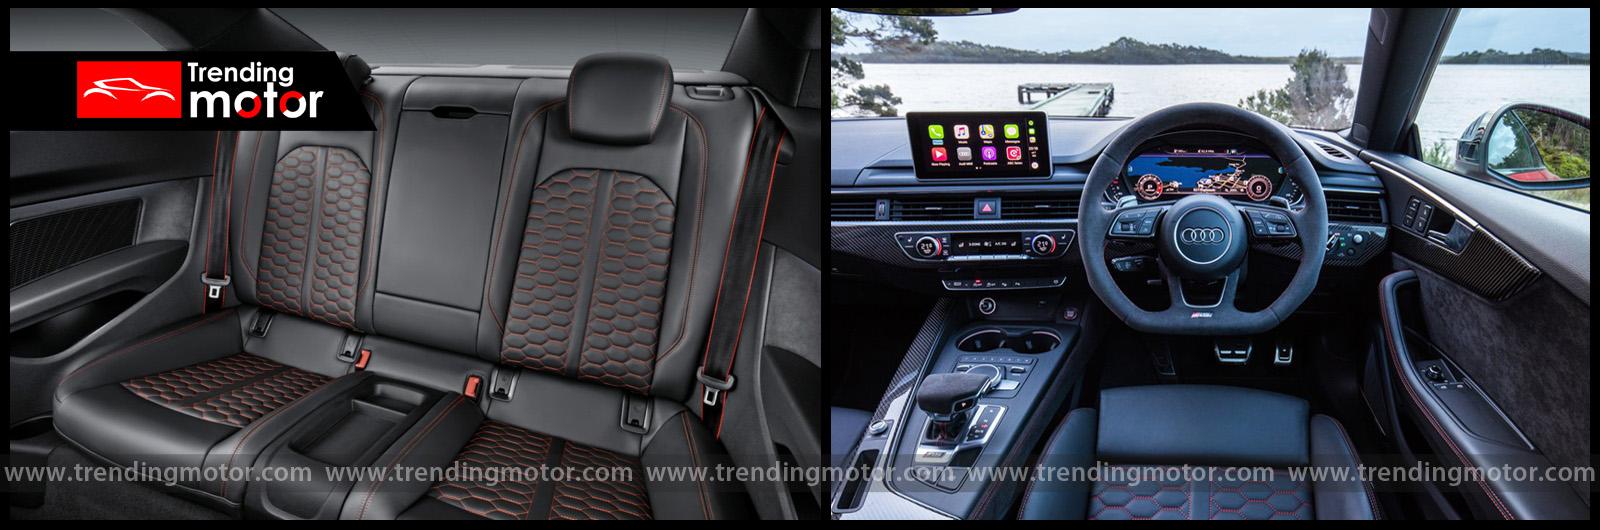 Audi-RS5-Coupe-interior-2018-trendingmotor